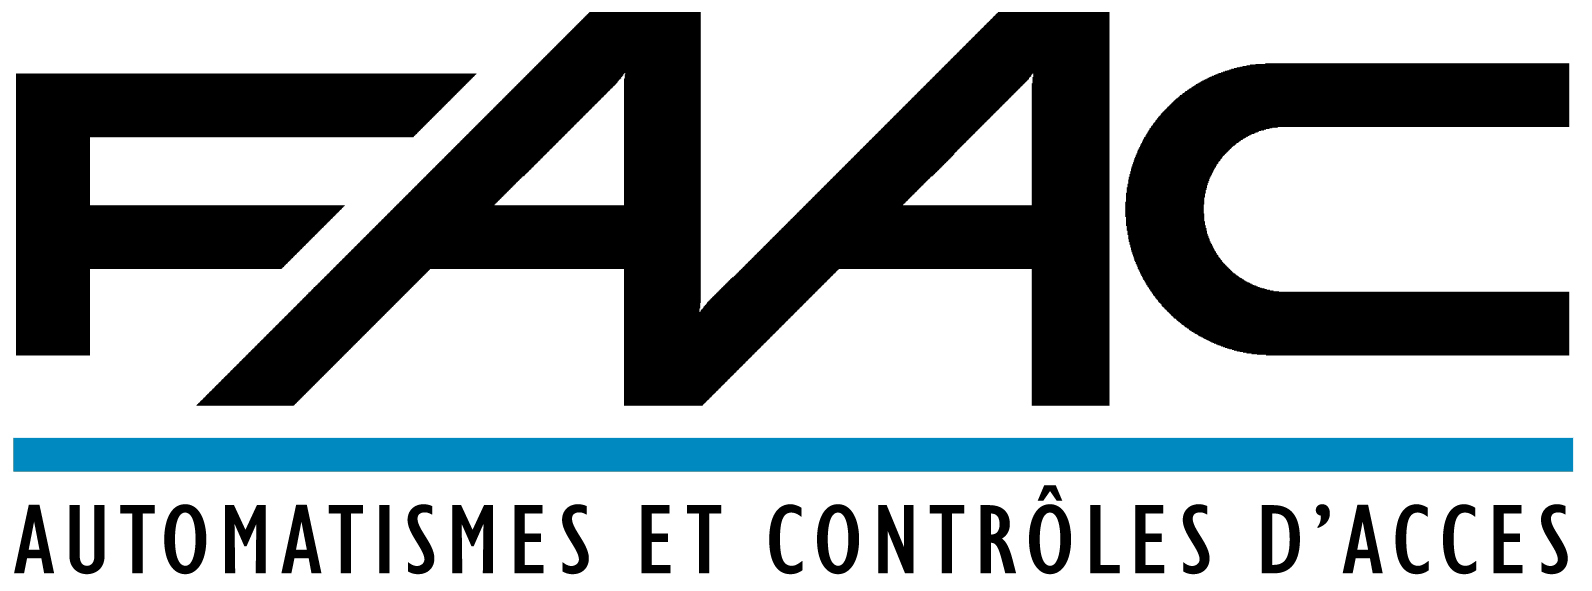 FAAC fabricant d'automatismes de portail